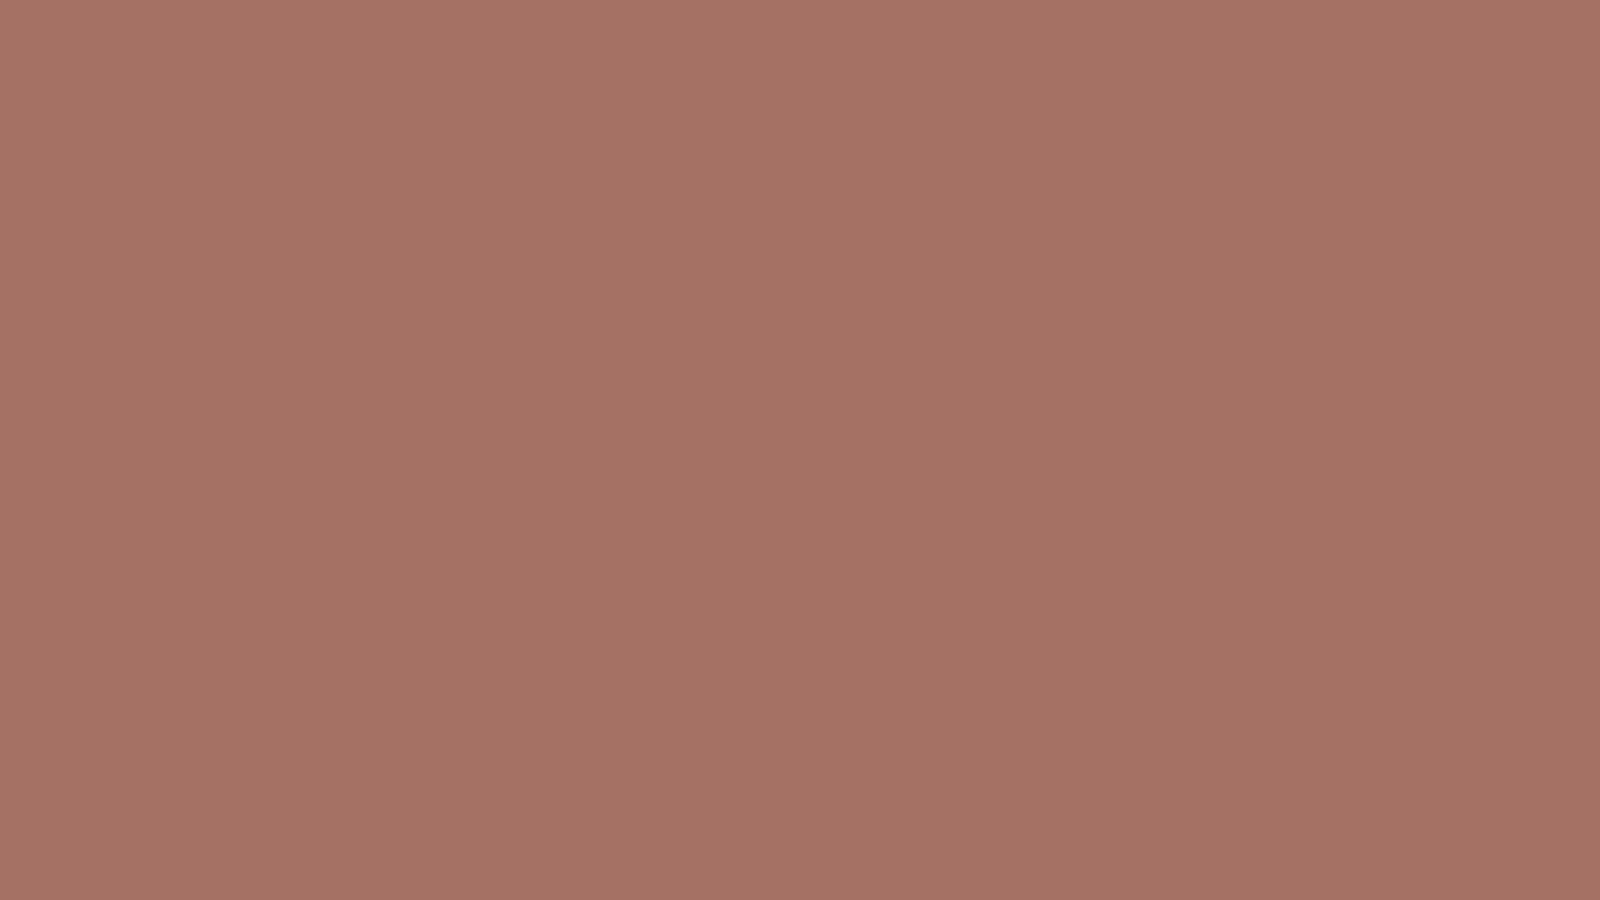 1600x900 Blast-off Bronze Solid Color Background